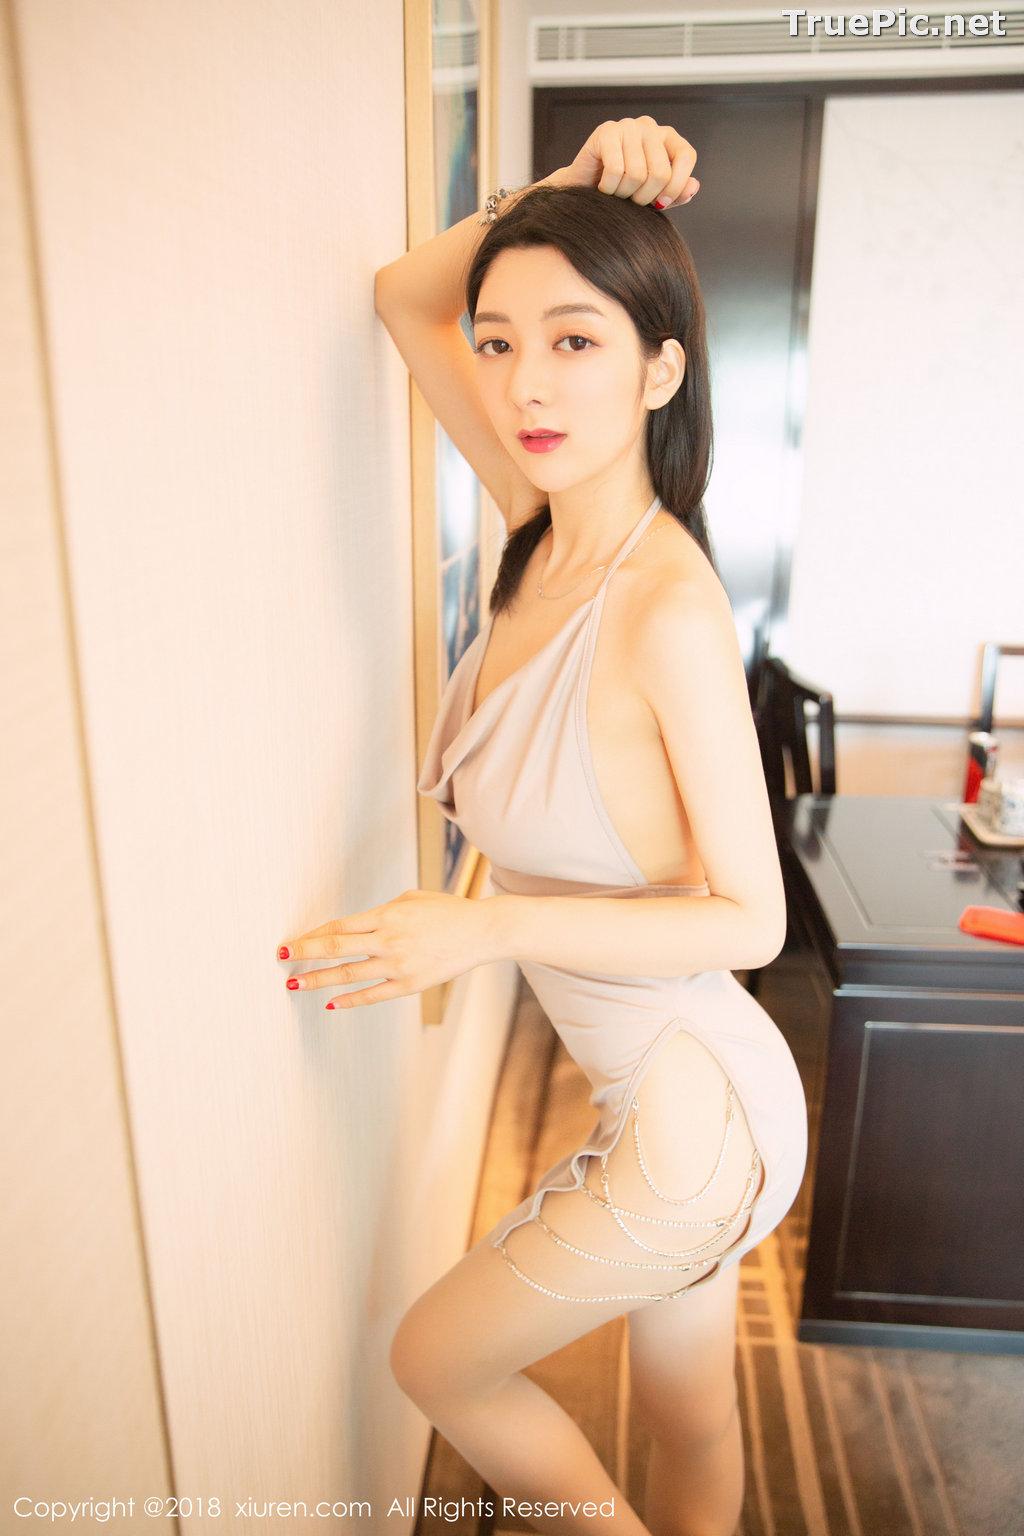 Image XIUREN No.1141 - Chinese Model - Xiao Reba (Angela小热巴) - Sexy Dress Tonight - TruePic.net - Picture-15